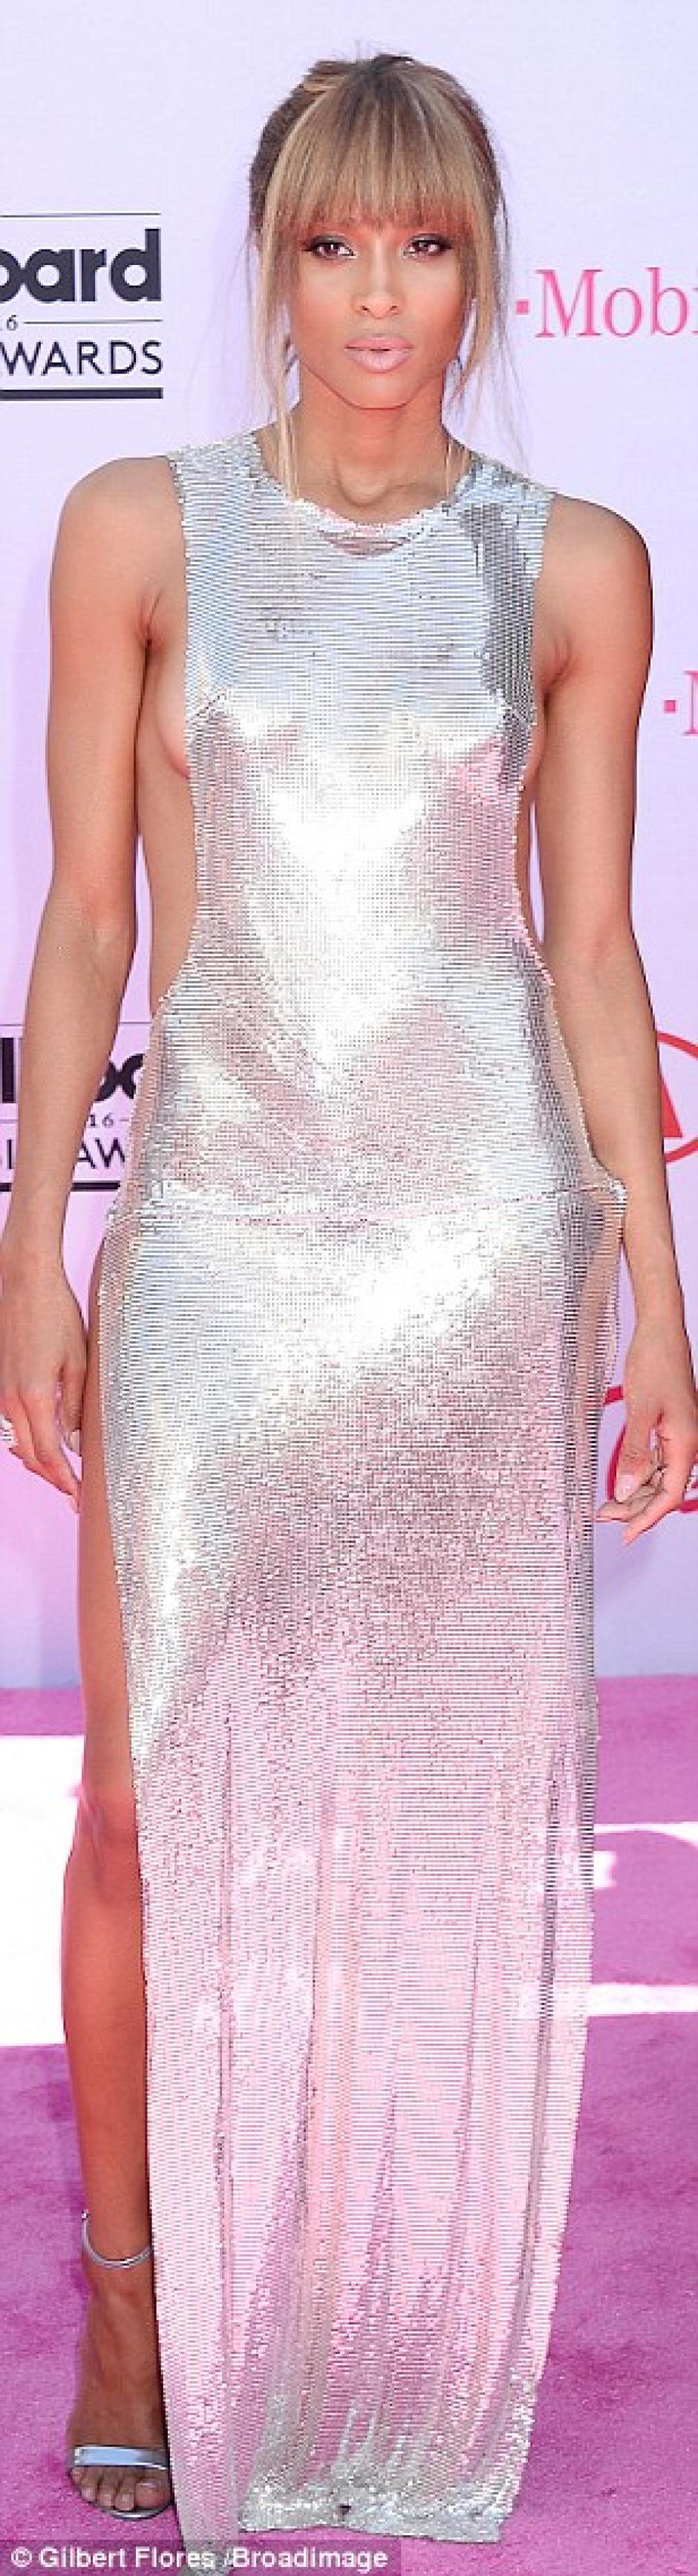 Ciara simpatiza por su carisma. (Foto: Daily Mail)